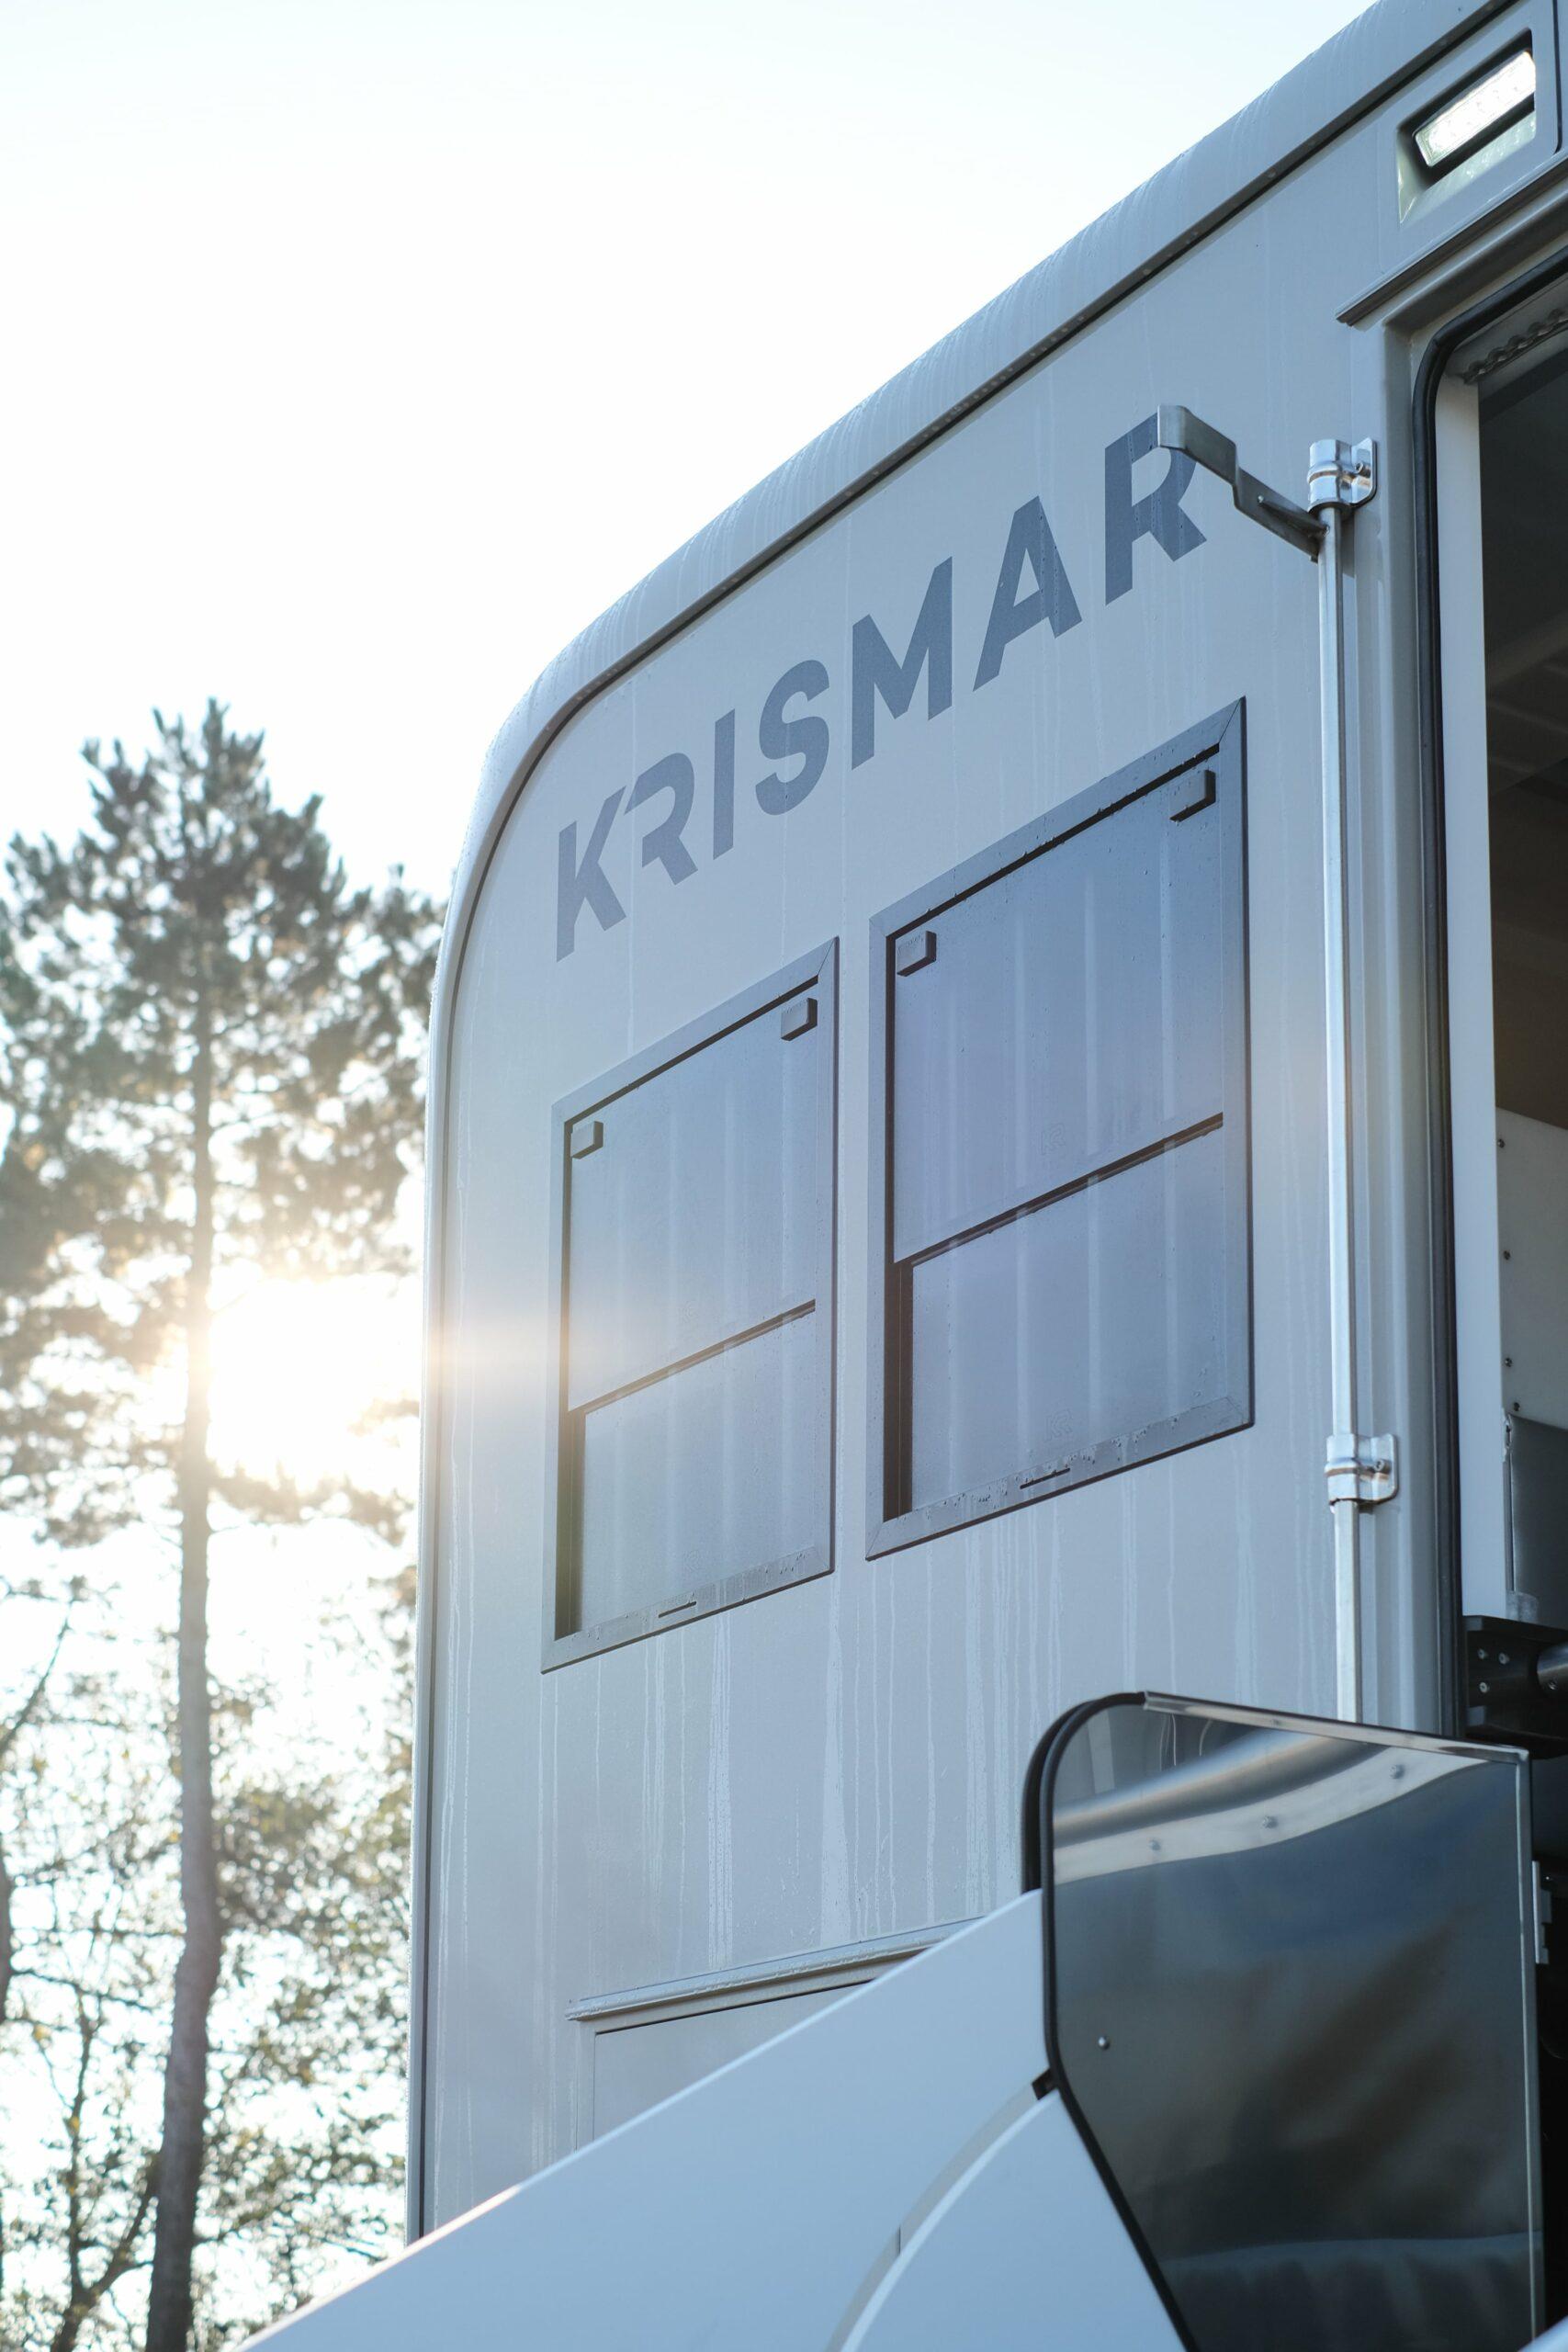 Image Krismar Horse Trucks